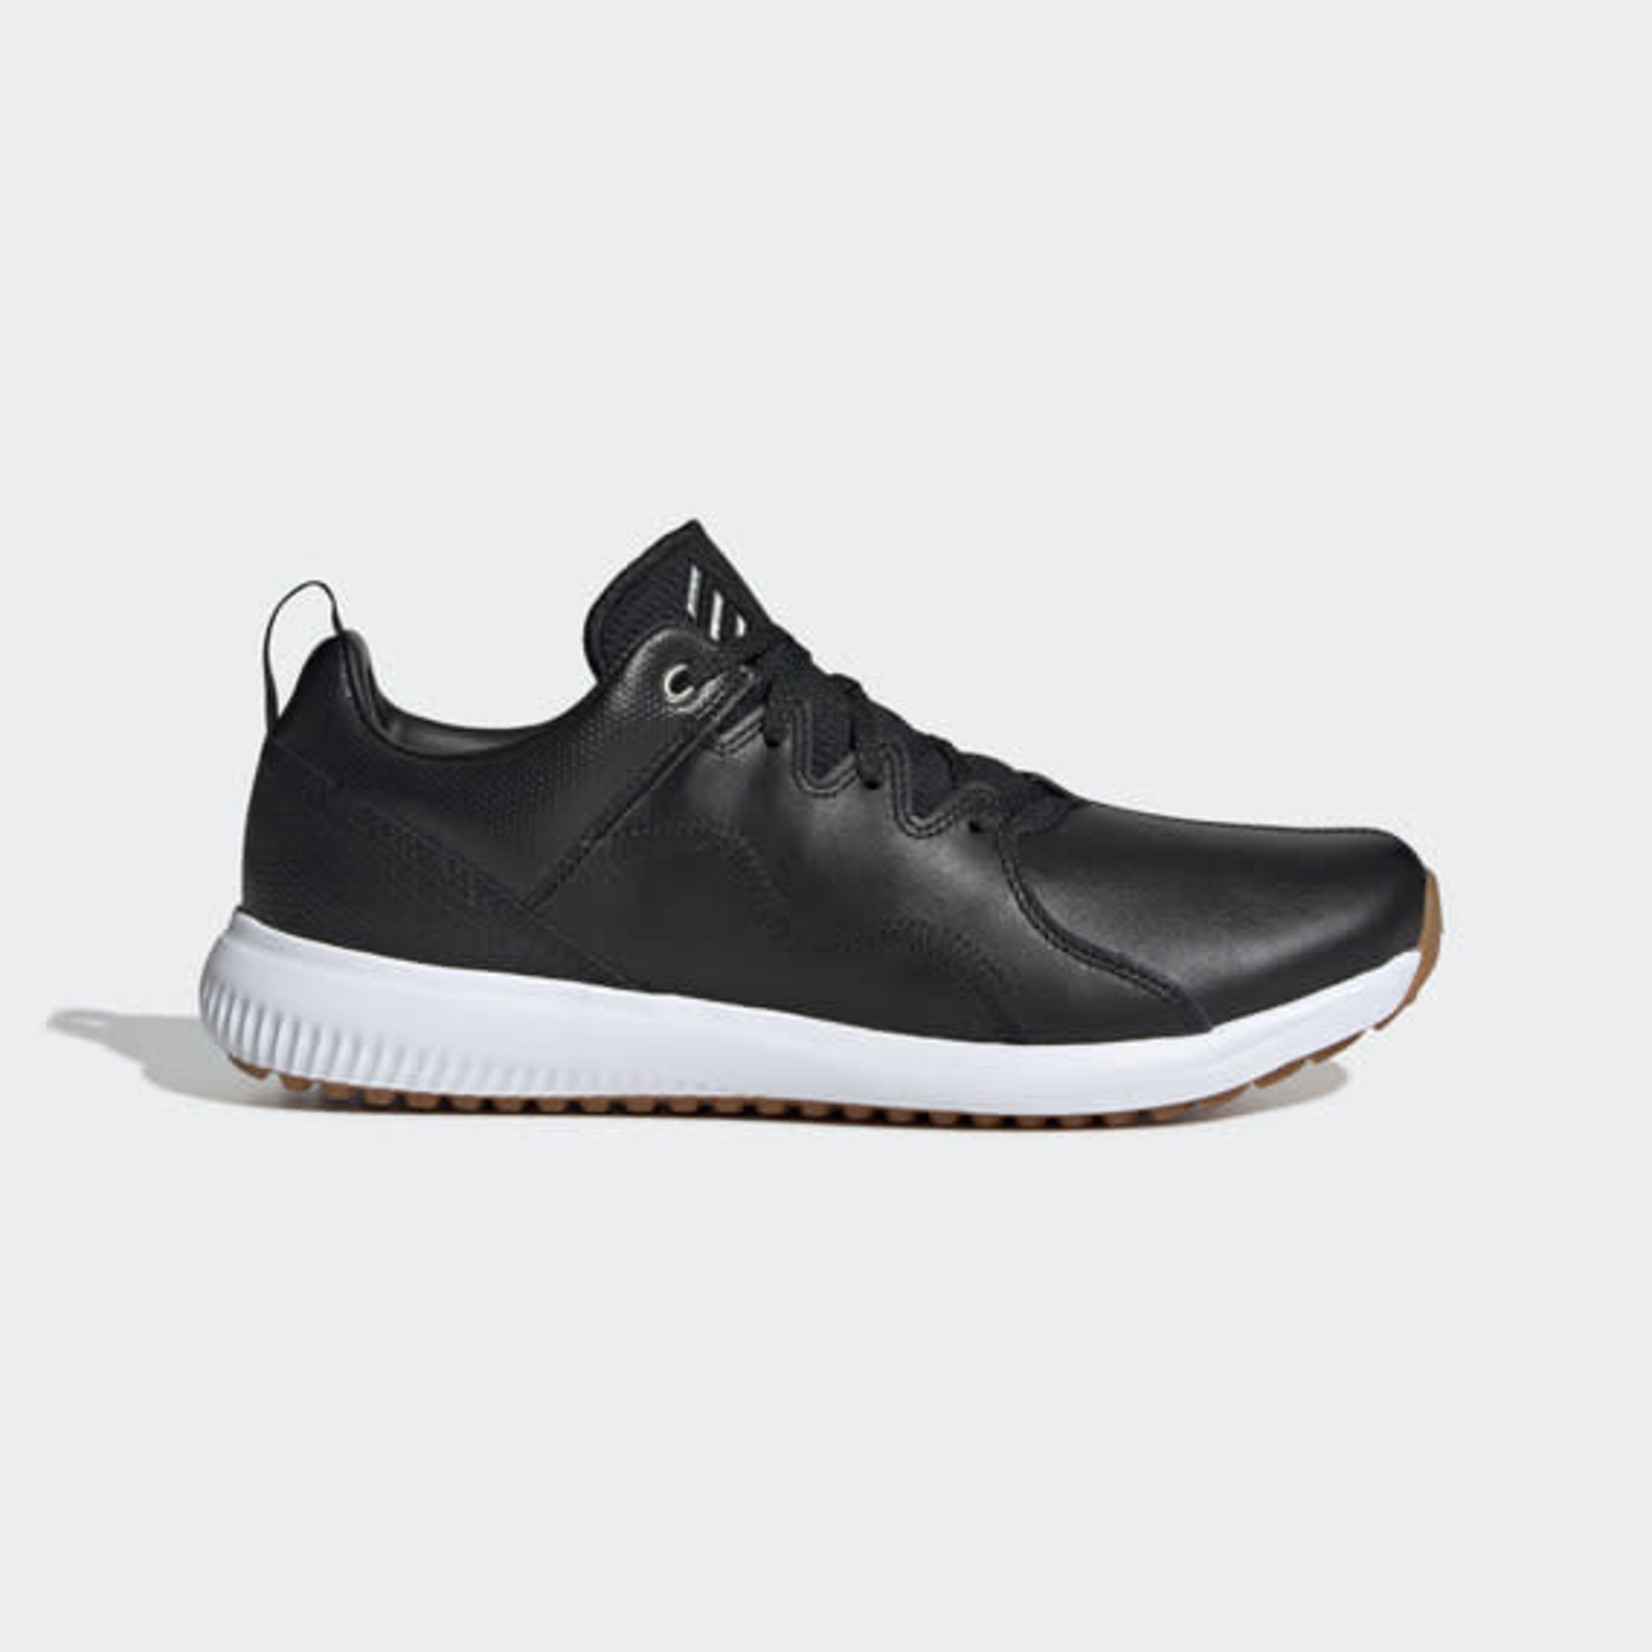 Adidas Adidas ADICROSS PPF Black/White UK: 7,5 / EU : 41,3